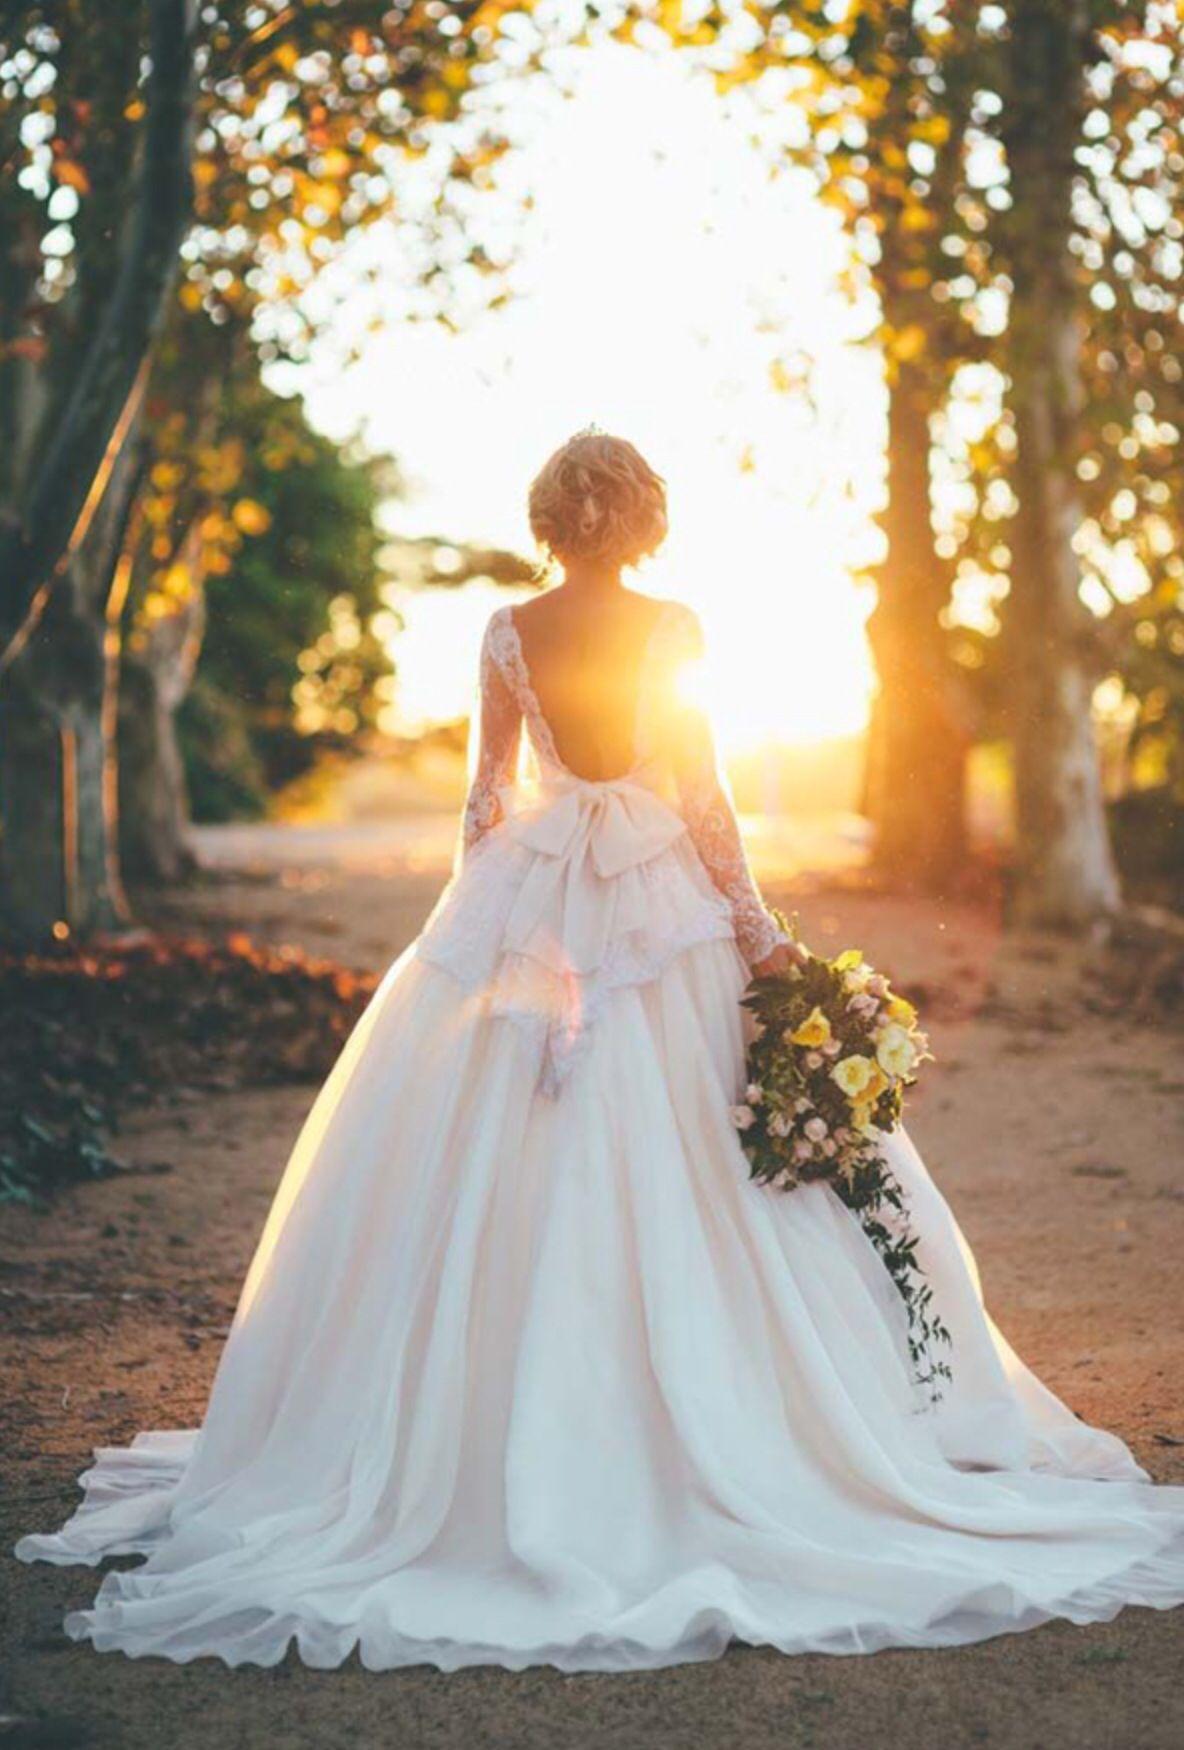 Build your own wedding dress  Pin by Dafne Chávez on Just married  Pinterest  Wedding dress